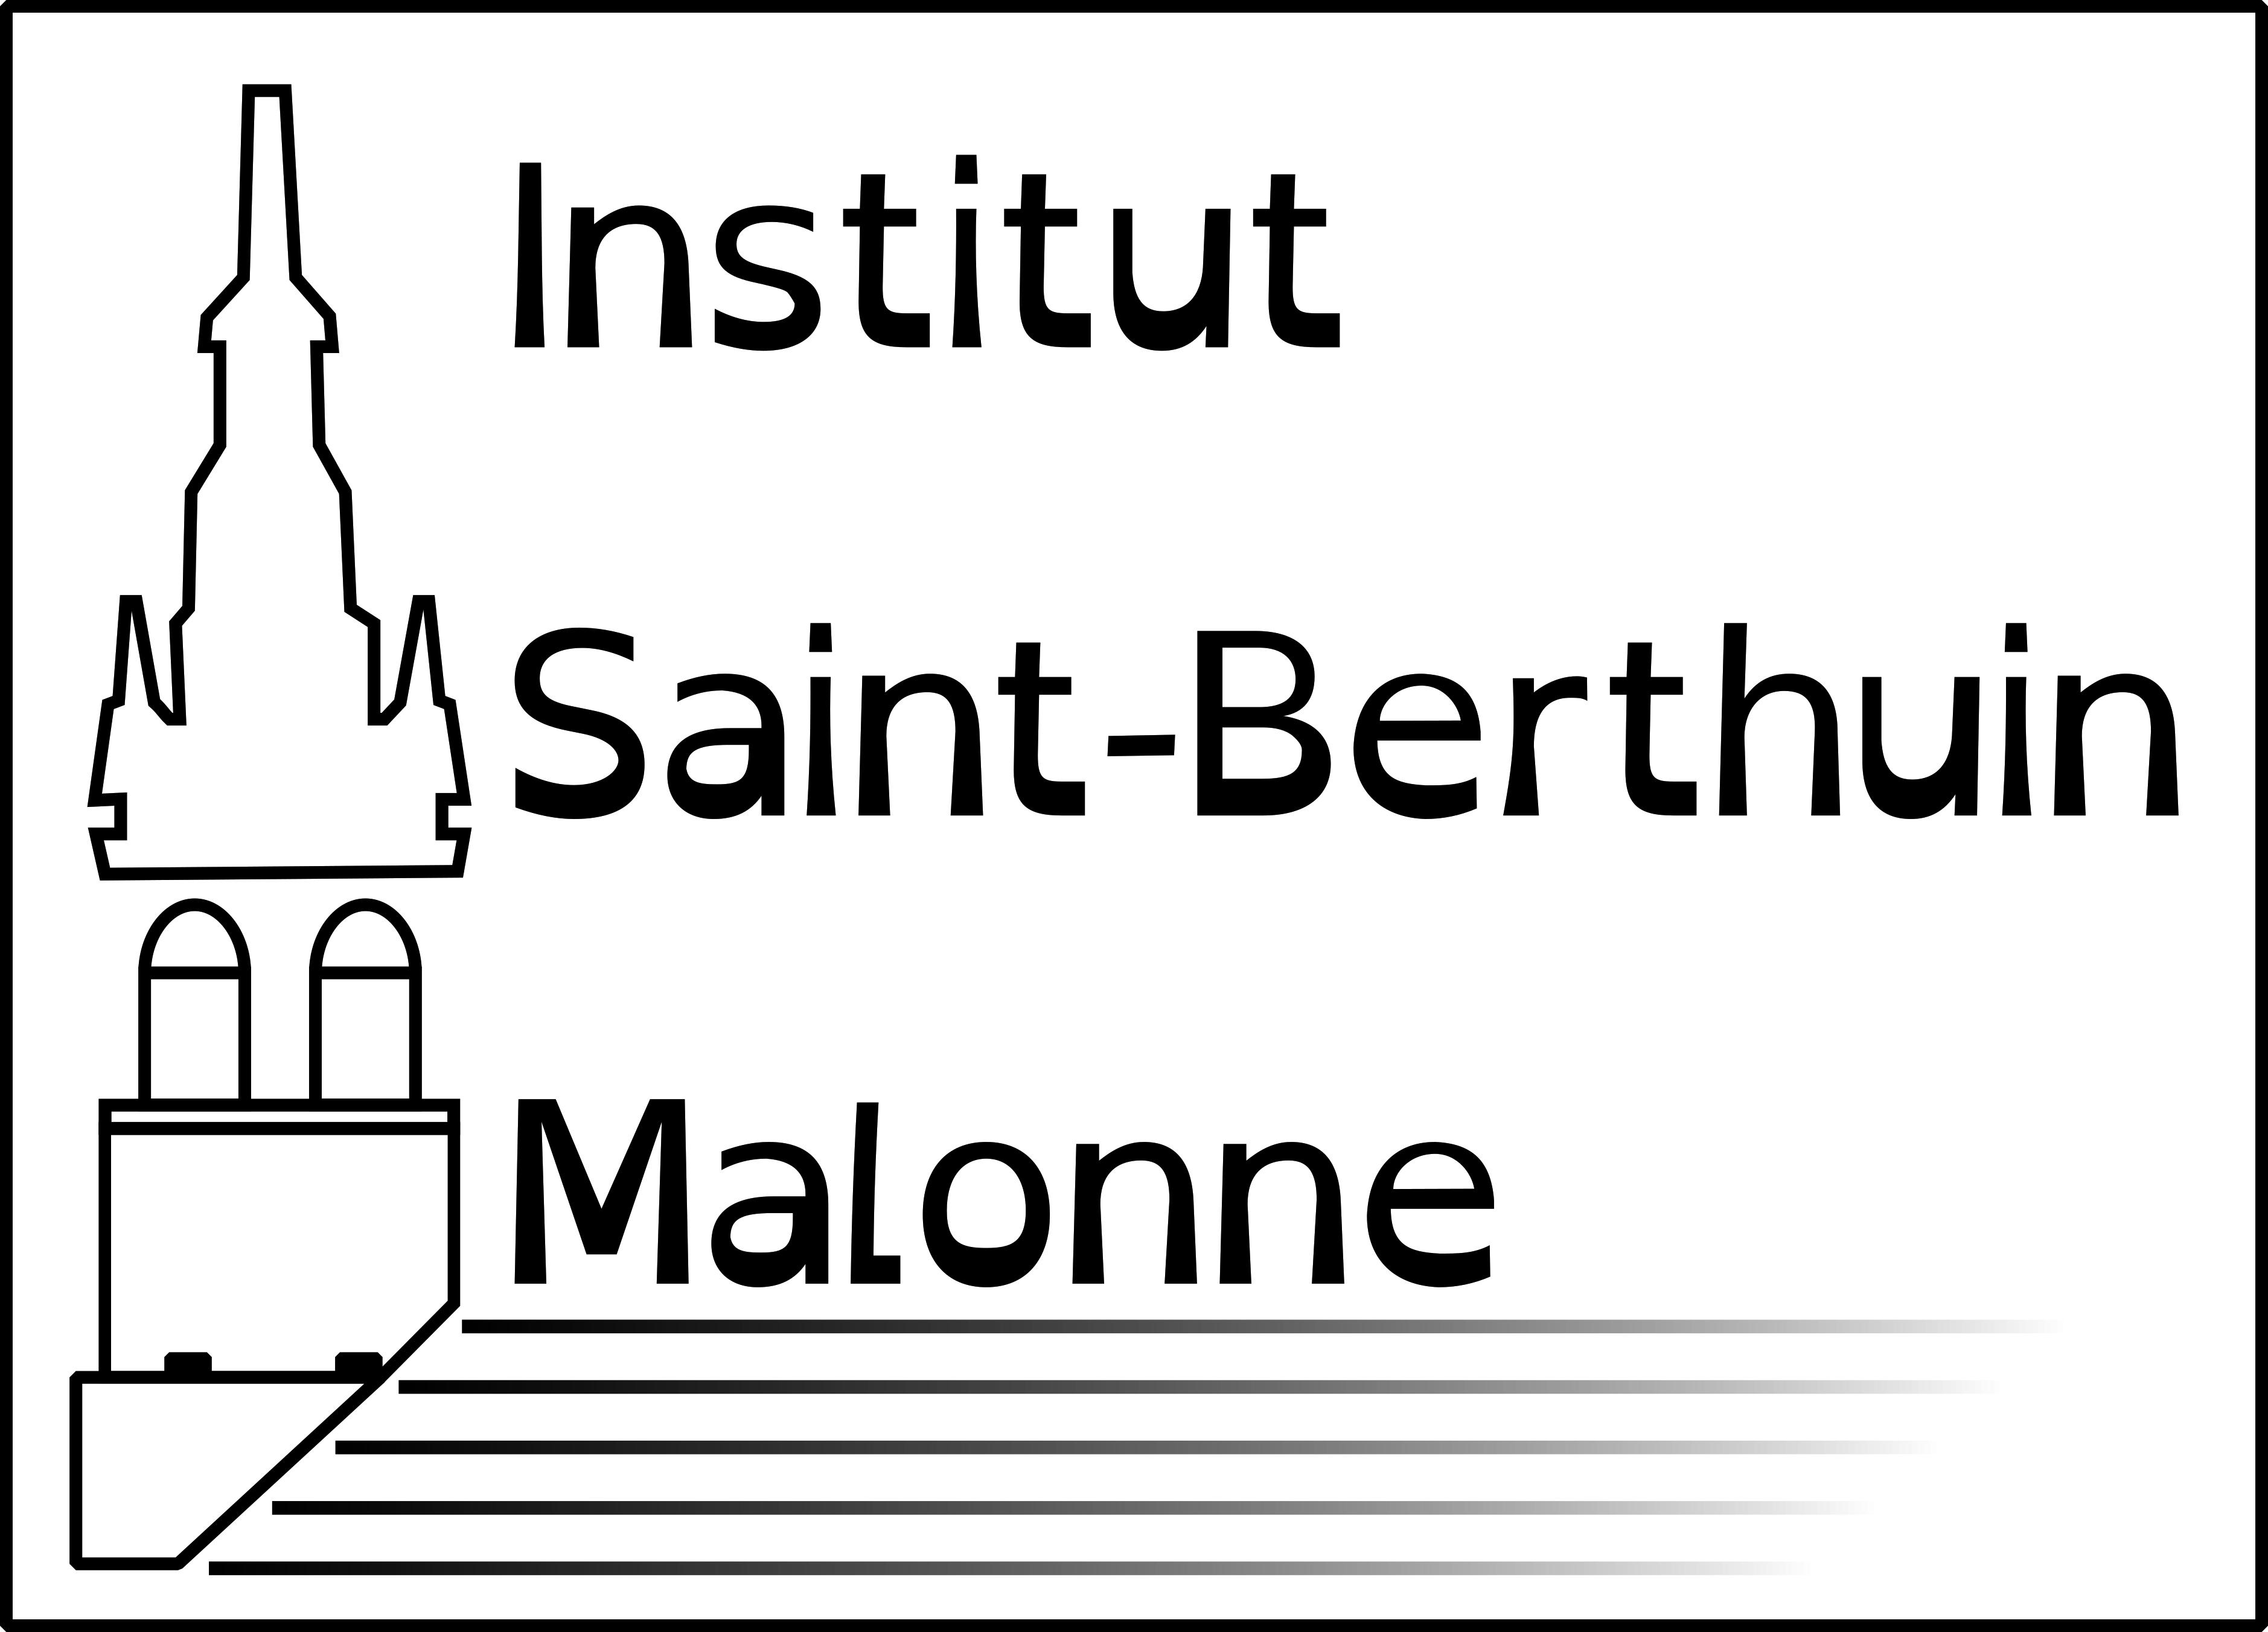 Institut St-Berthuin Malonne